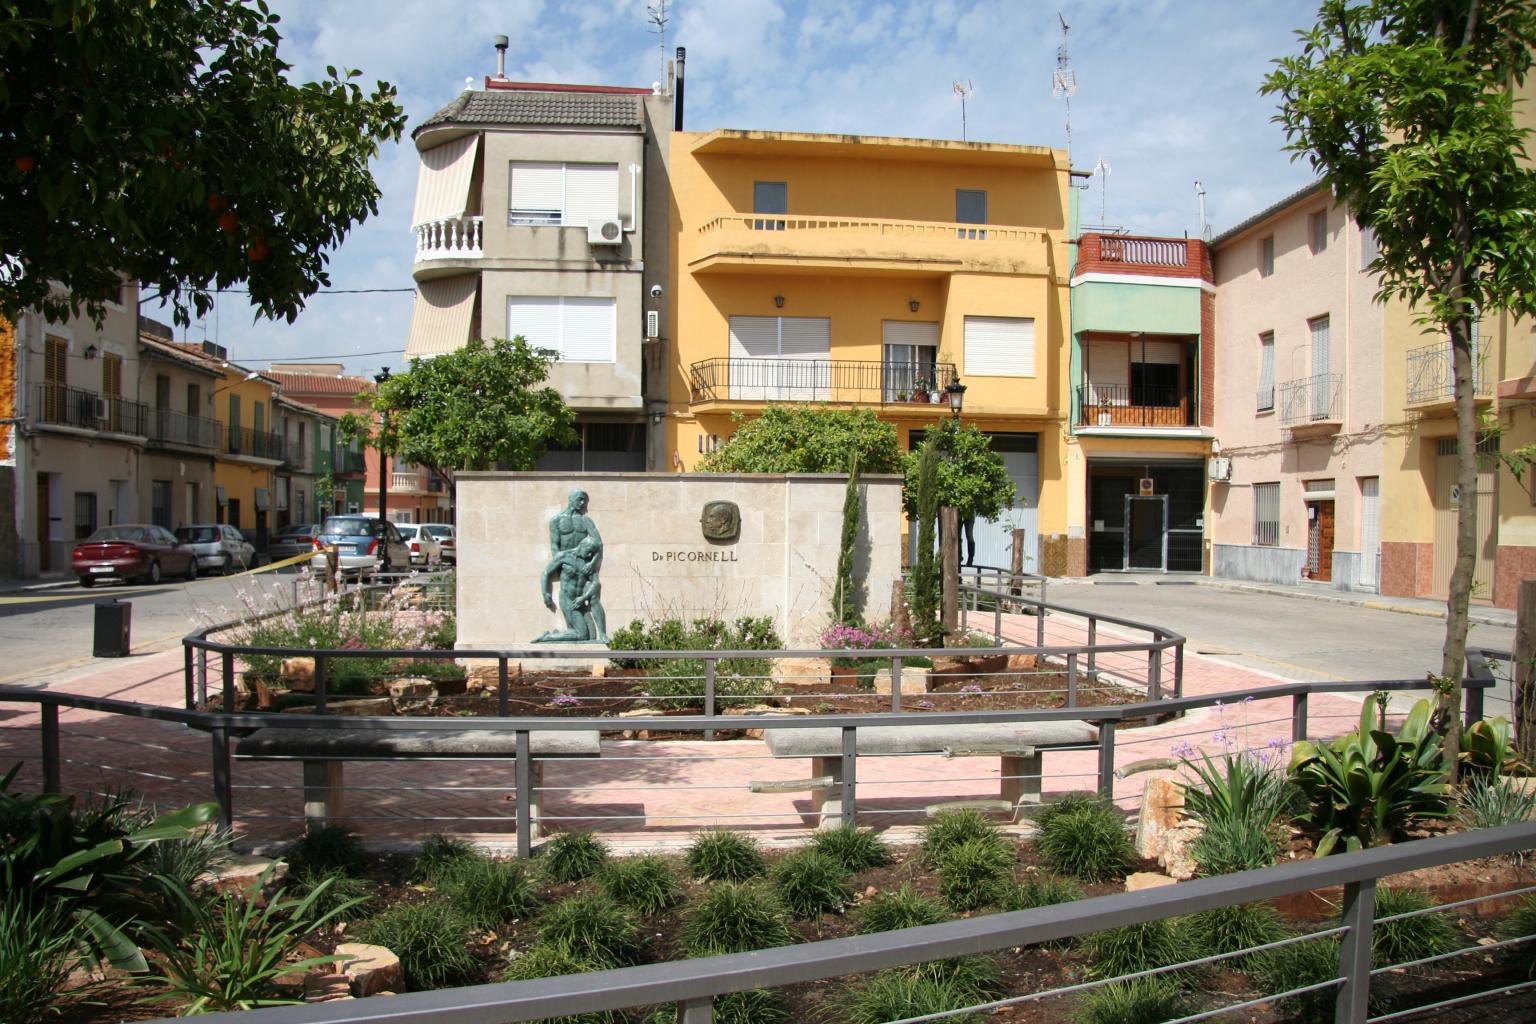 Plaça del doctor Picornell, l'any 2010